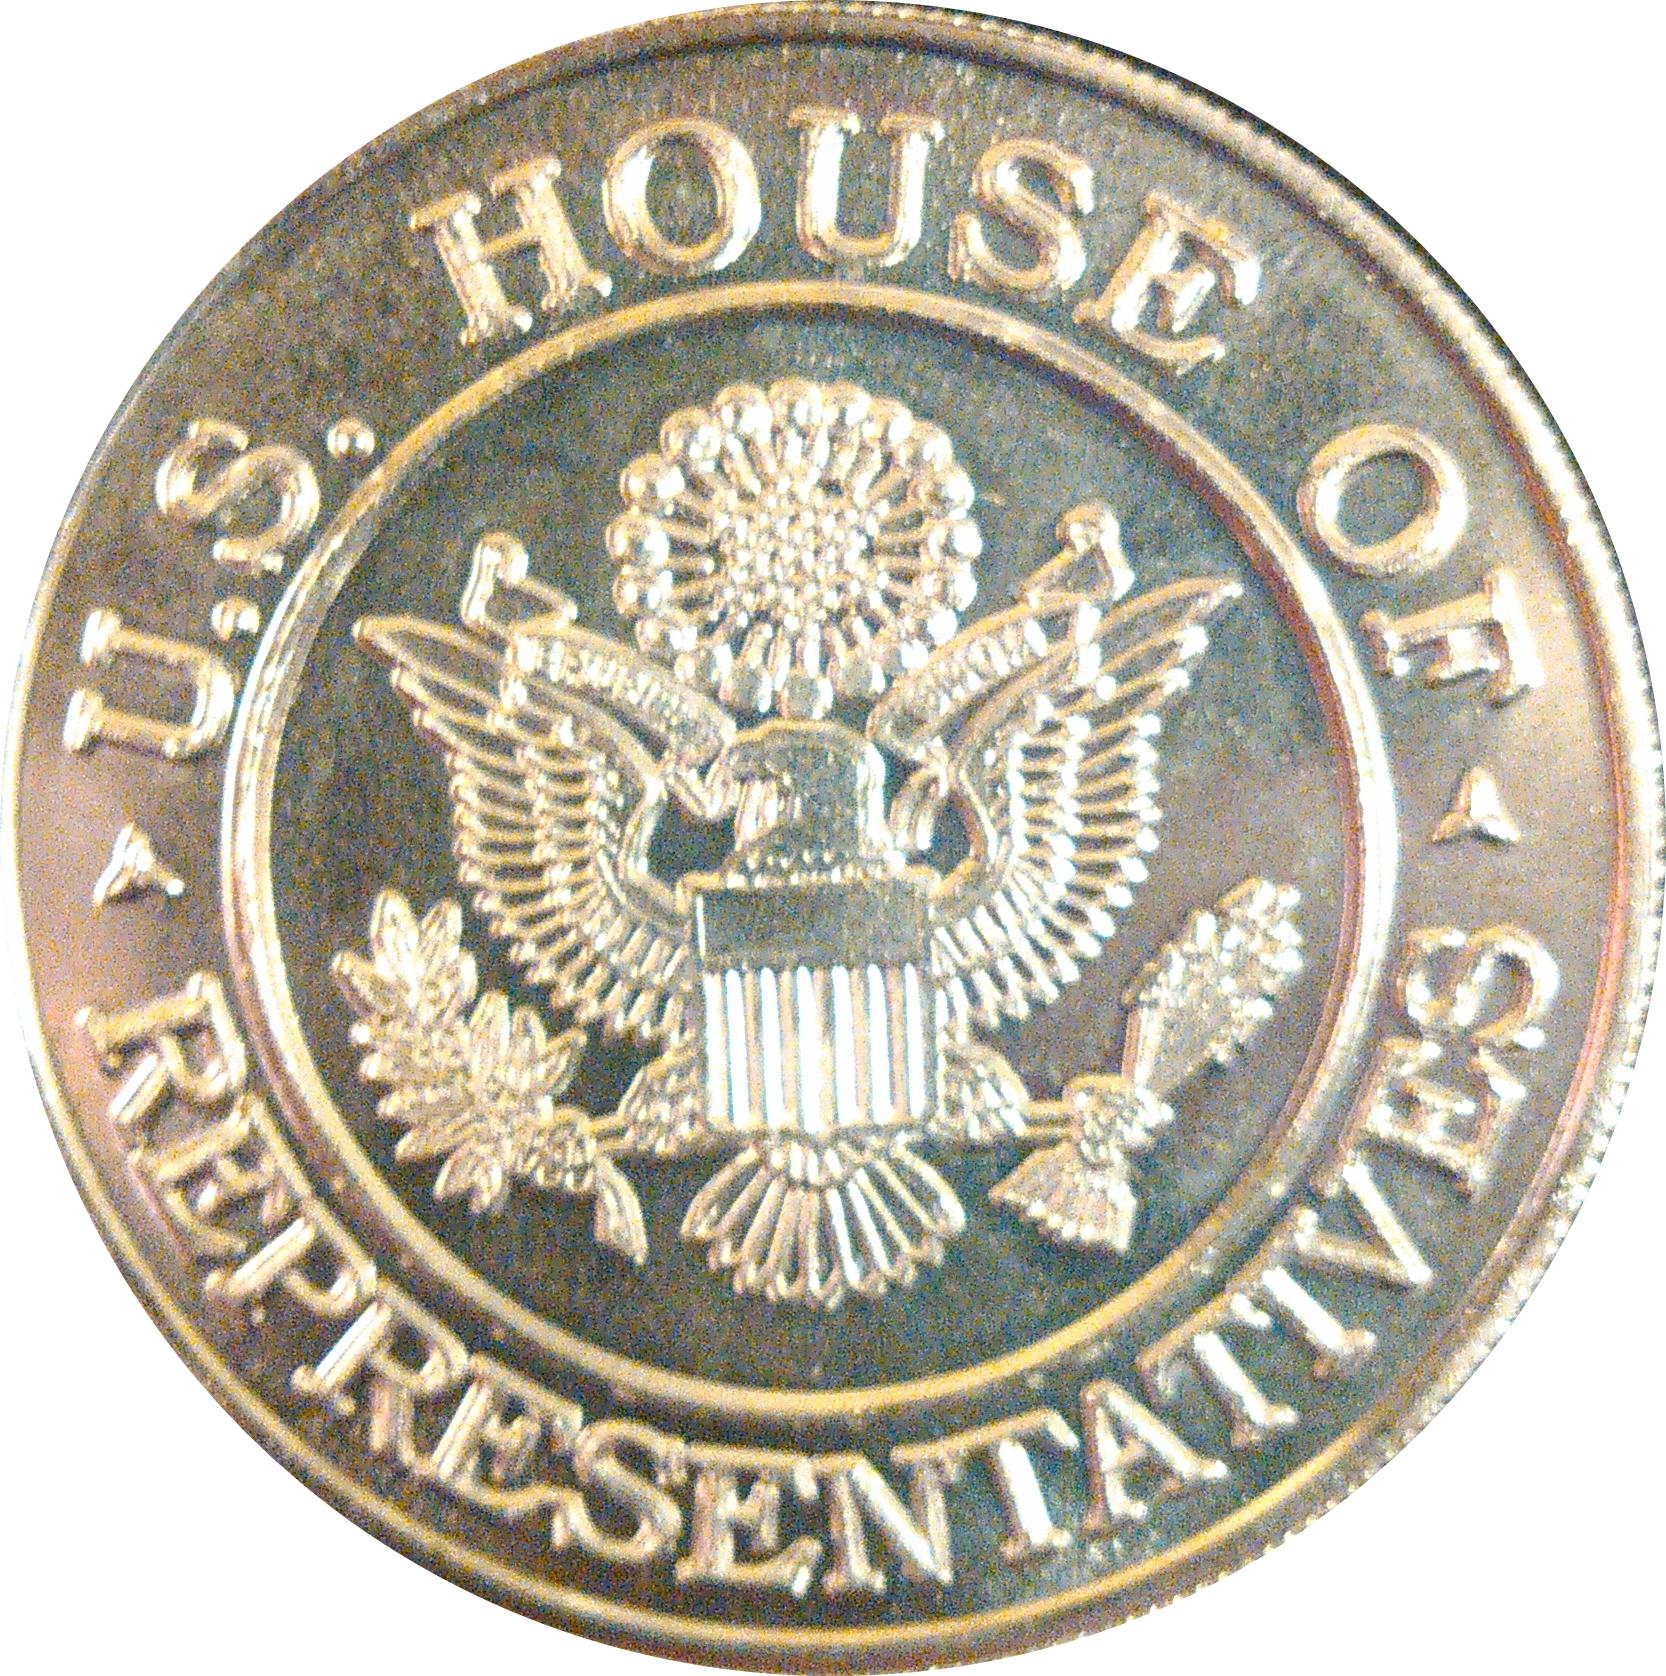 US House of Representatives Tokens Numista